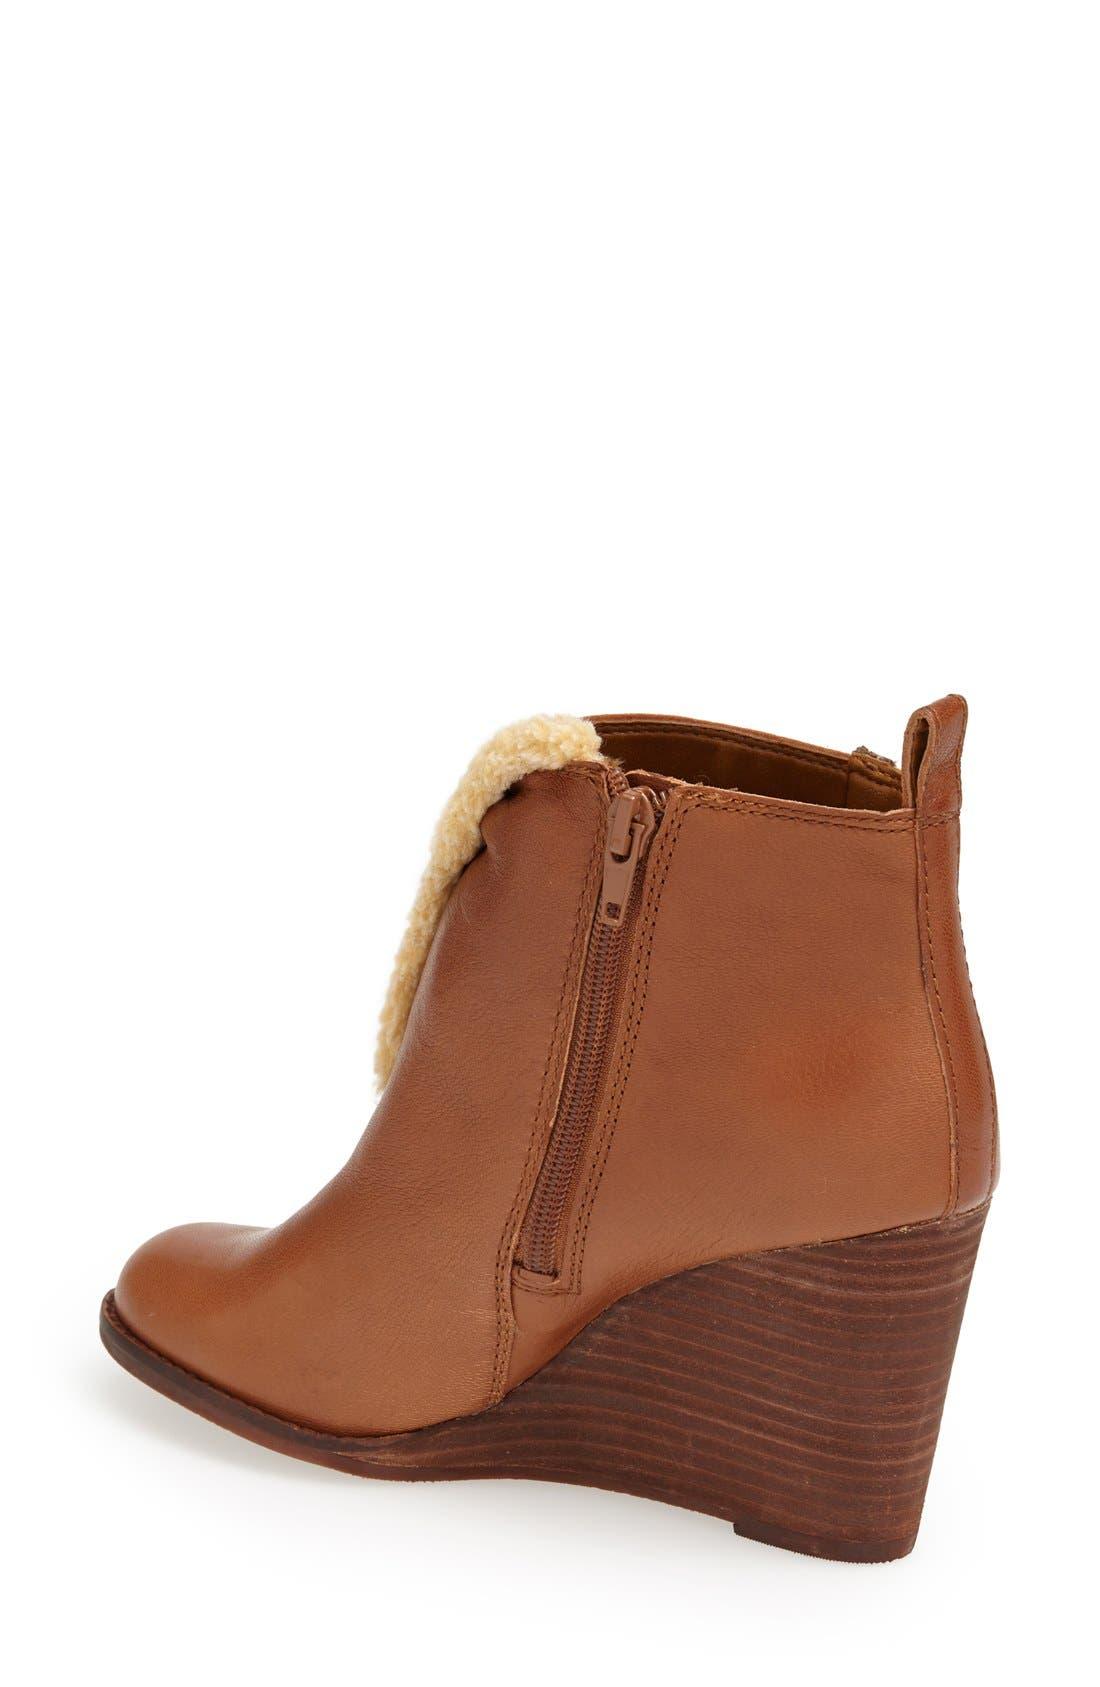 Alternate Image 2  - Lucky Brand 'Yorque' Wedge Leather Bootie (Women)